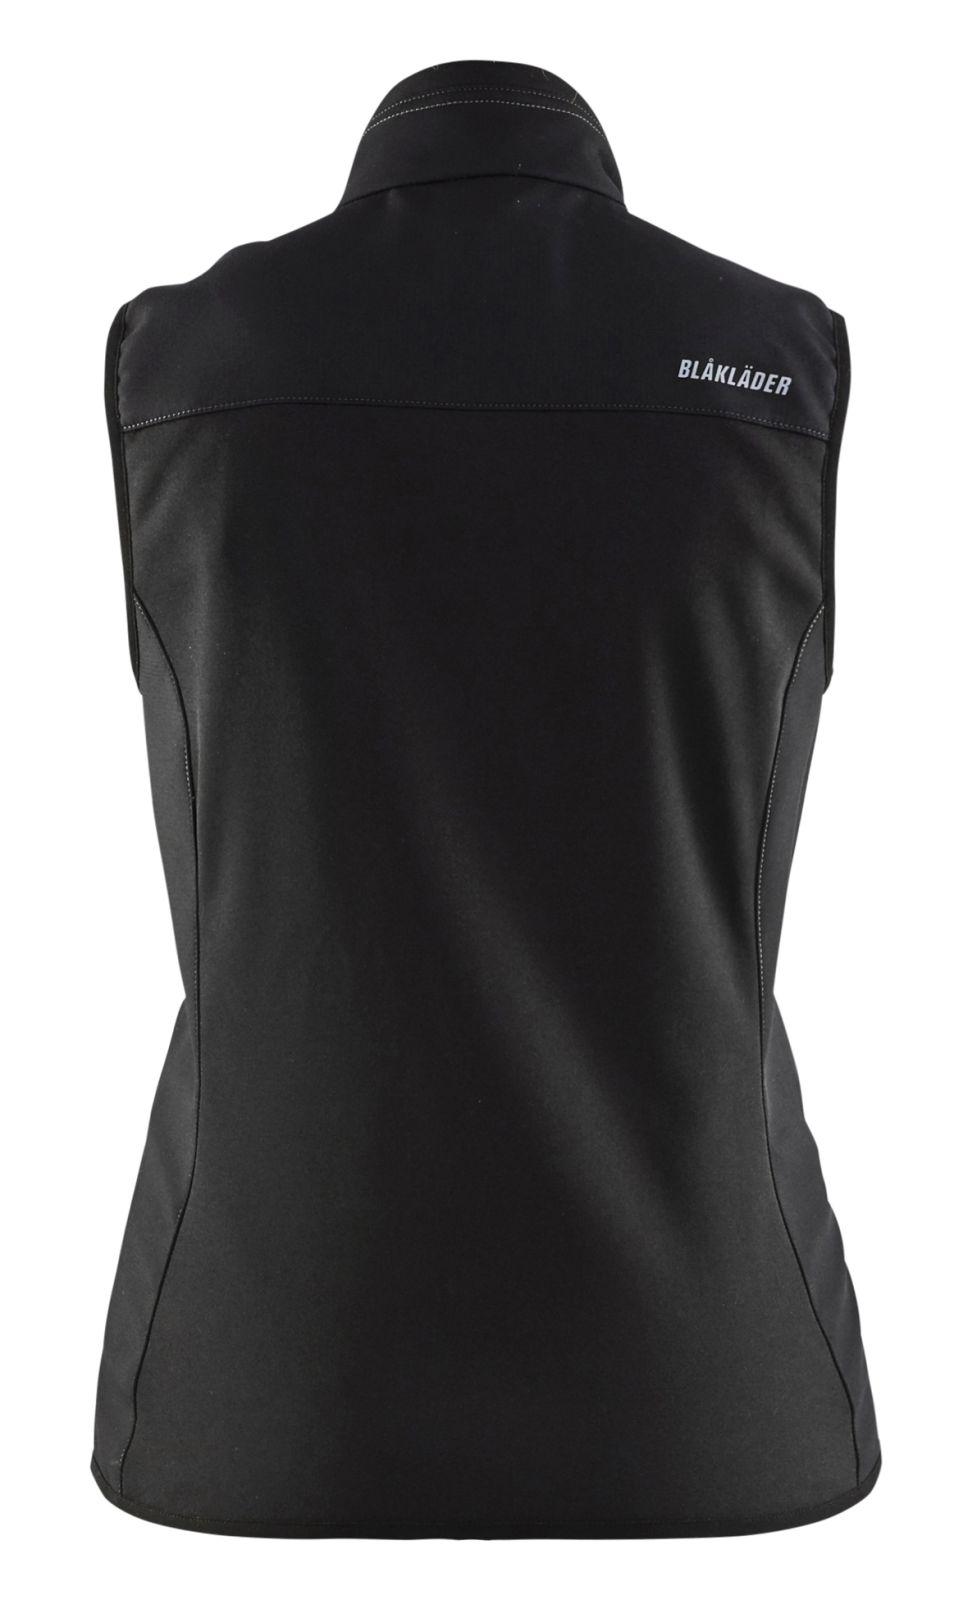 Blaklader Dames bodywarmers 38512516 zwart-donkergrijs(9998)